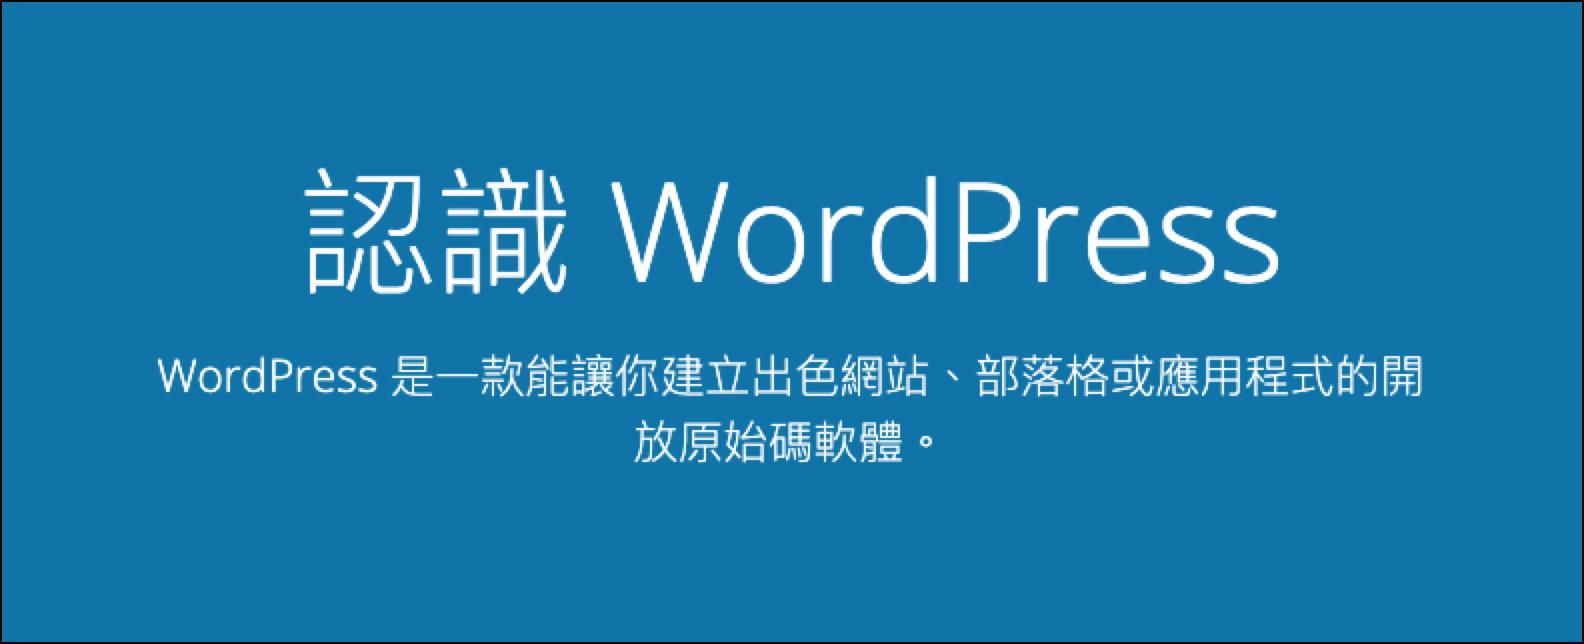 wphack15 - 如何保護你的 WordPress 網站?掌握這 9 個小技巧遠離駭客入侵